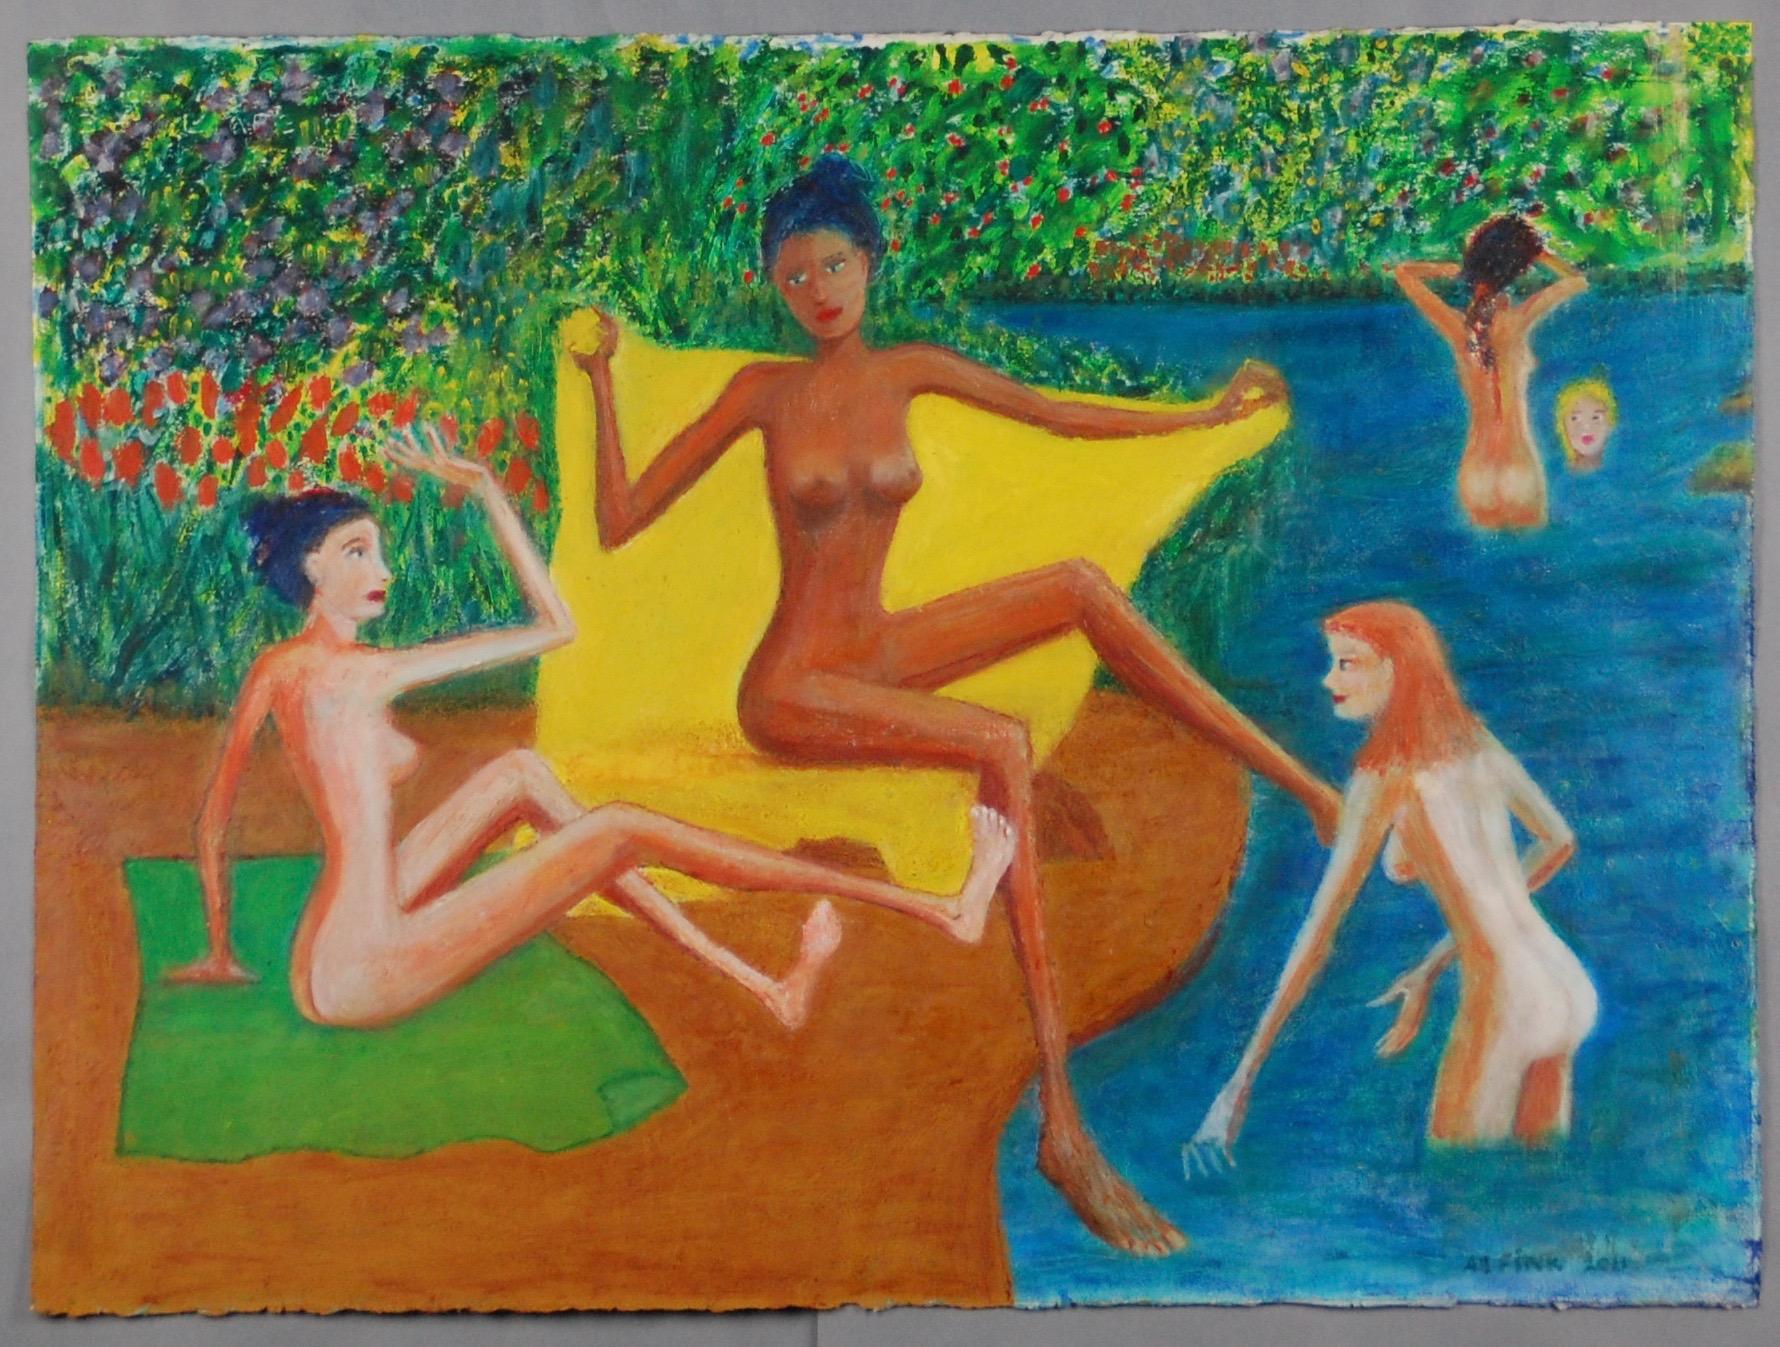 Bathers after Renoir